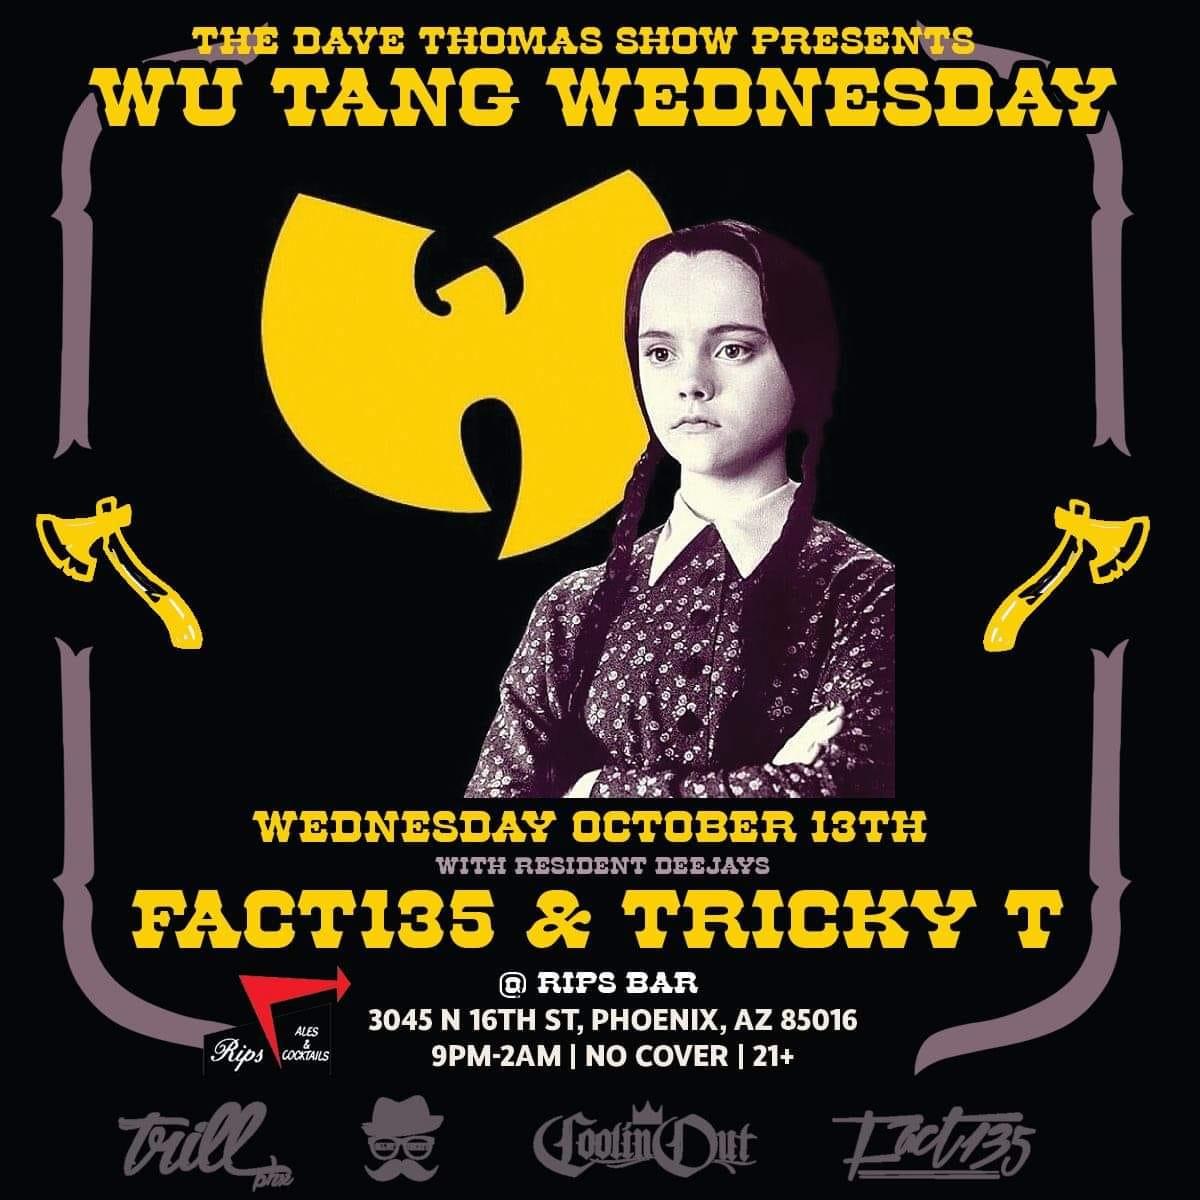 Wu-Tang Wednesday